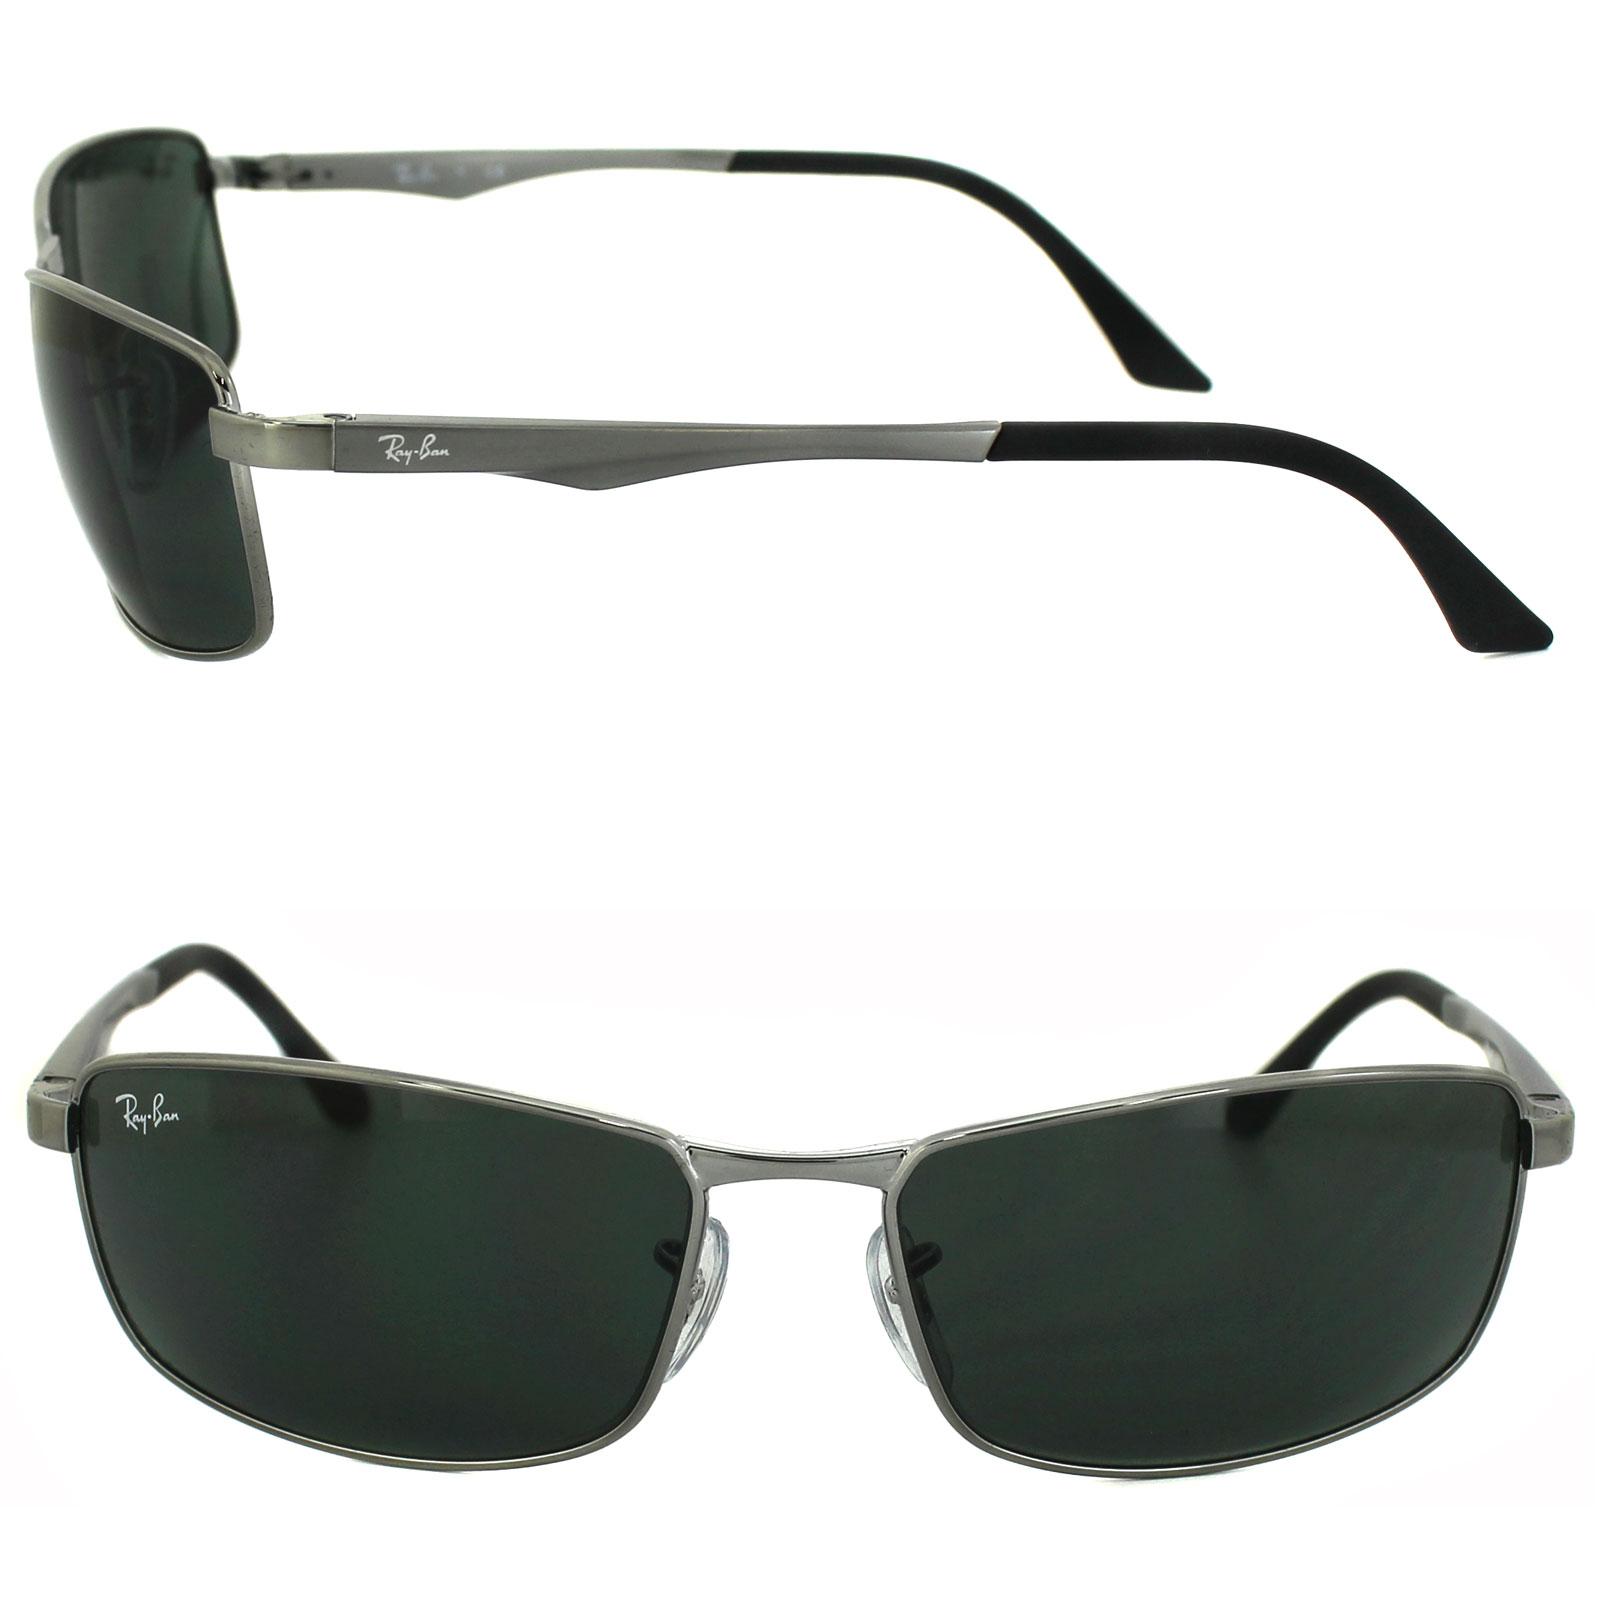 fd8e787727 RayBan Sunglasses 3498 004 71 Gunmetal Green